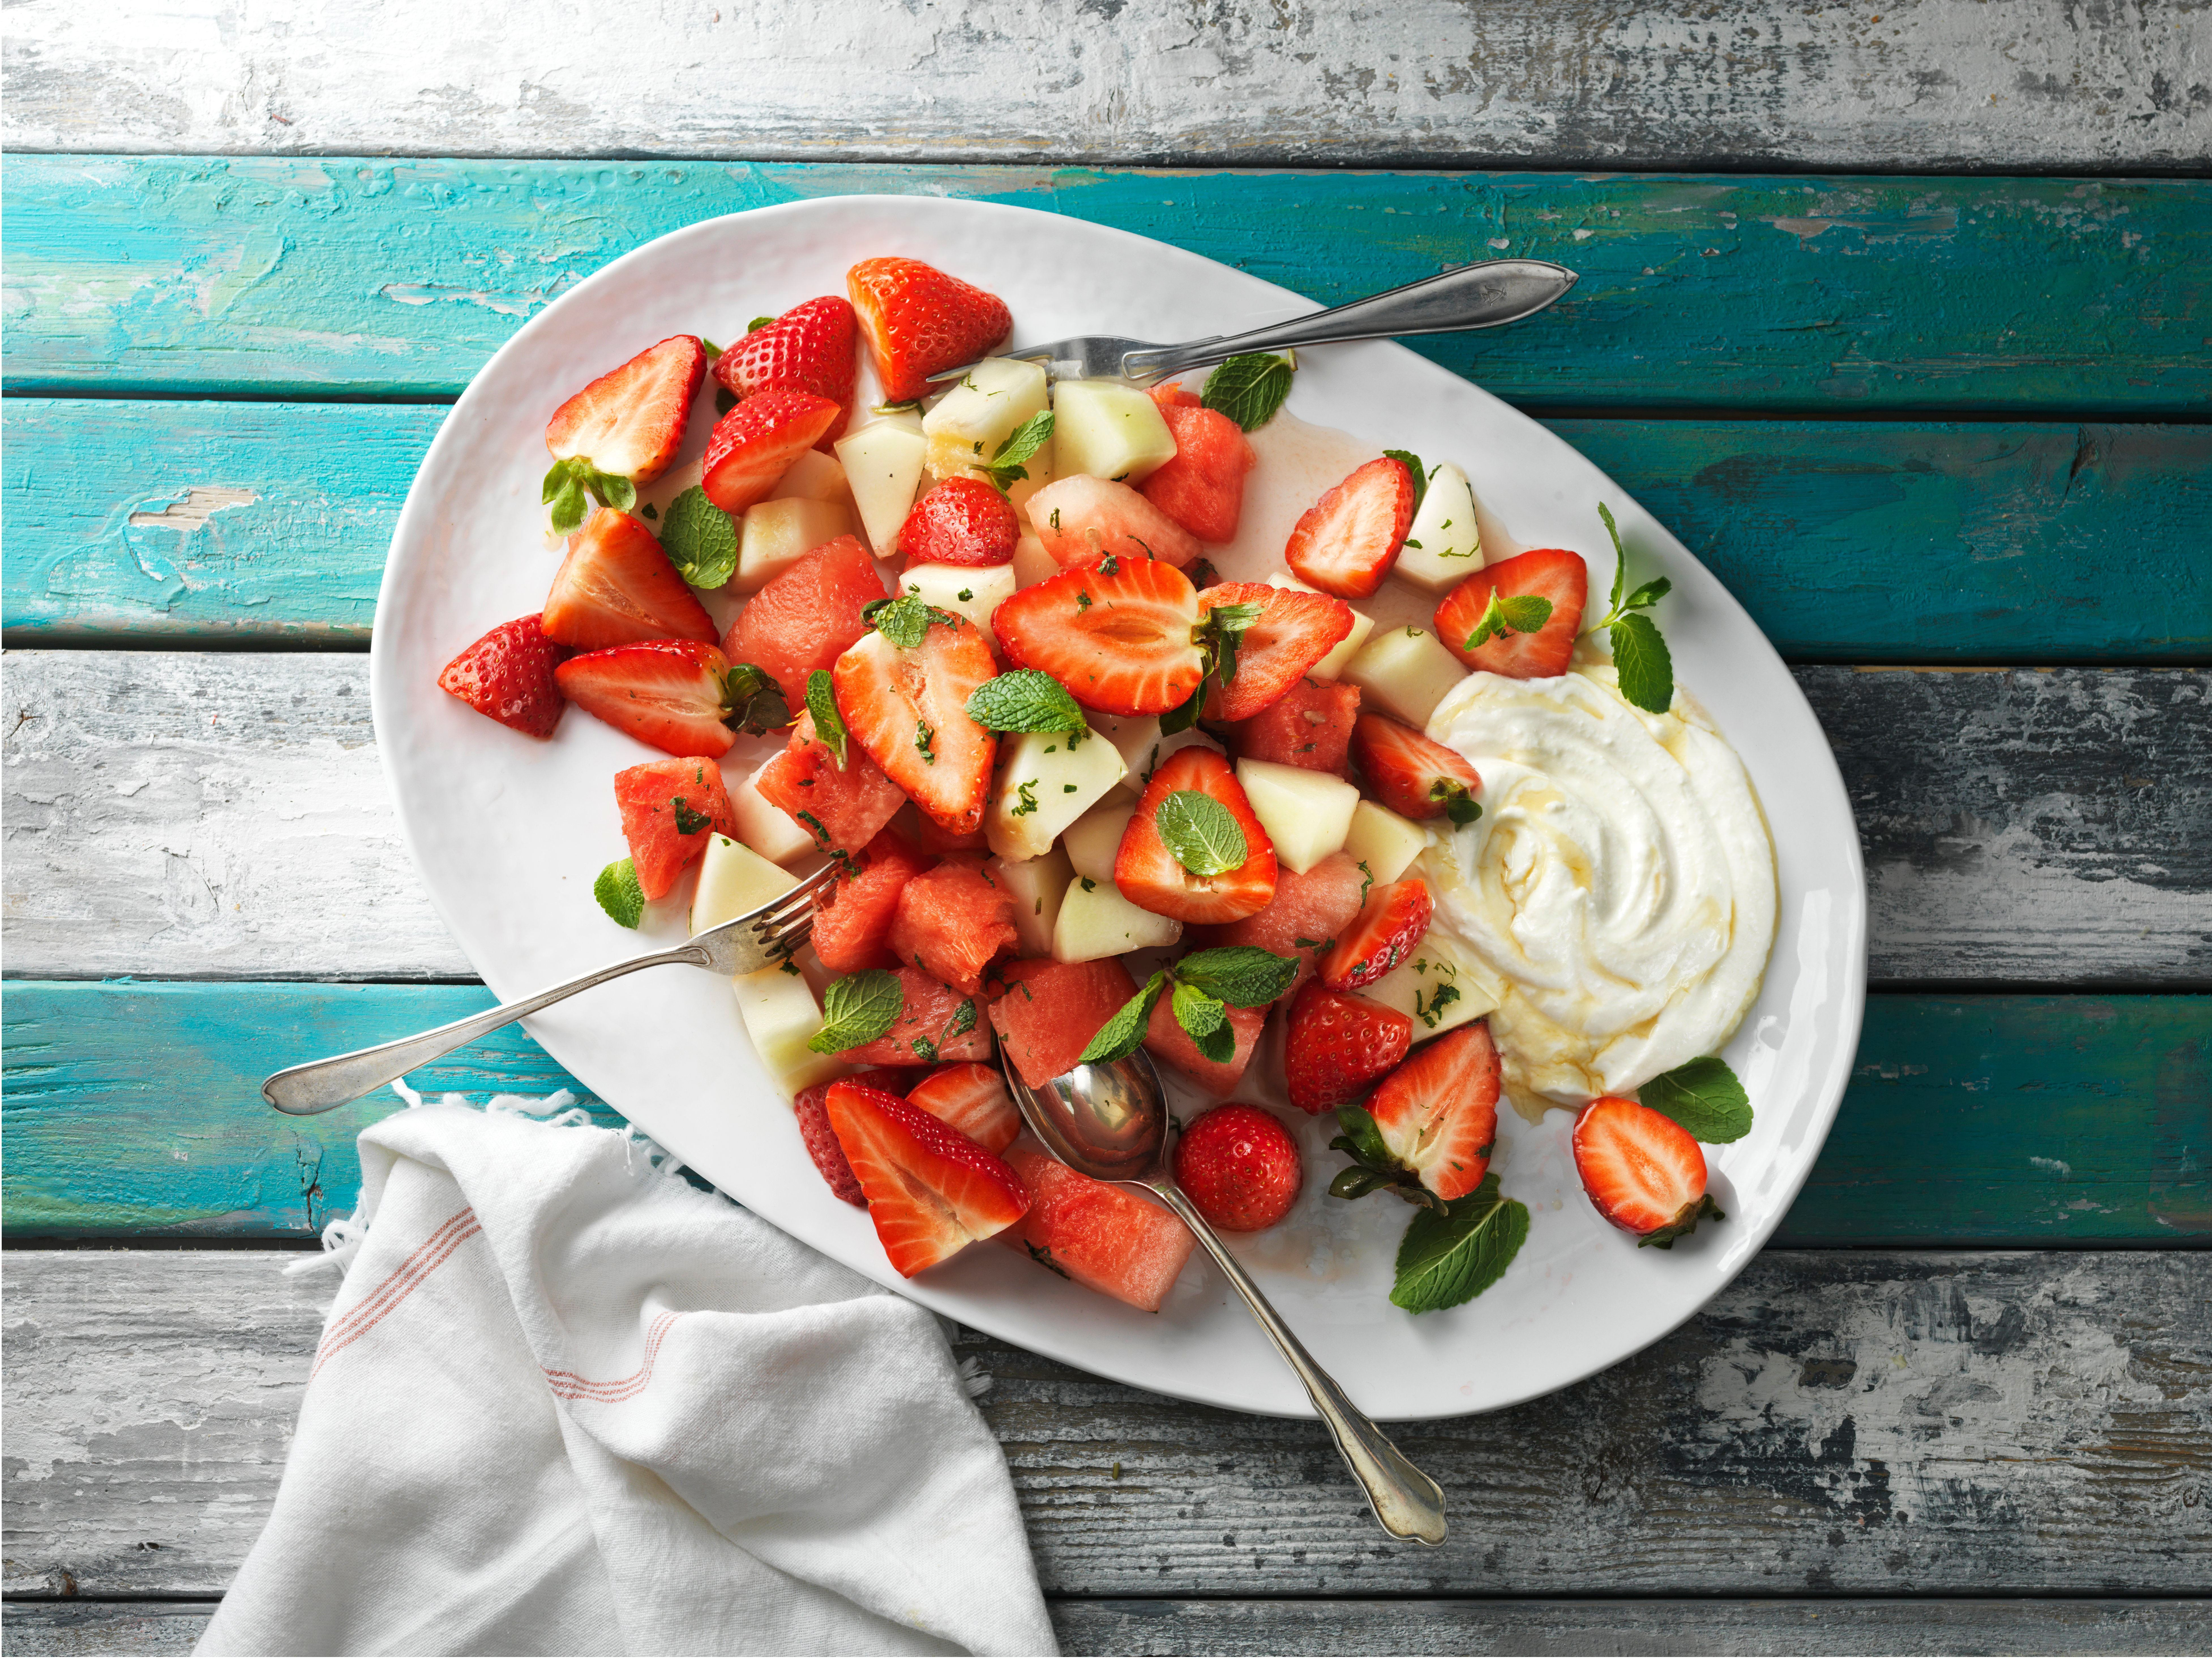 Jordbærsalat med melon, citron og mynte